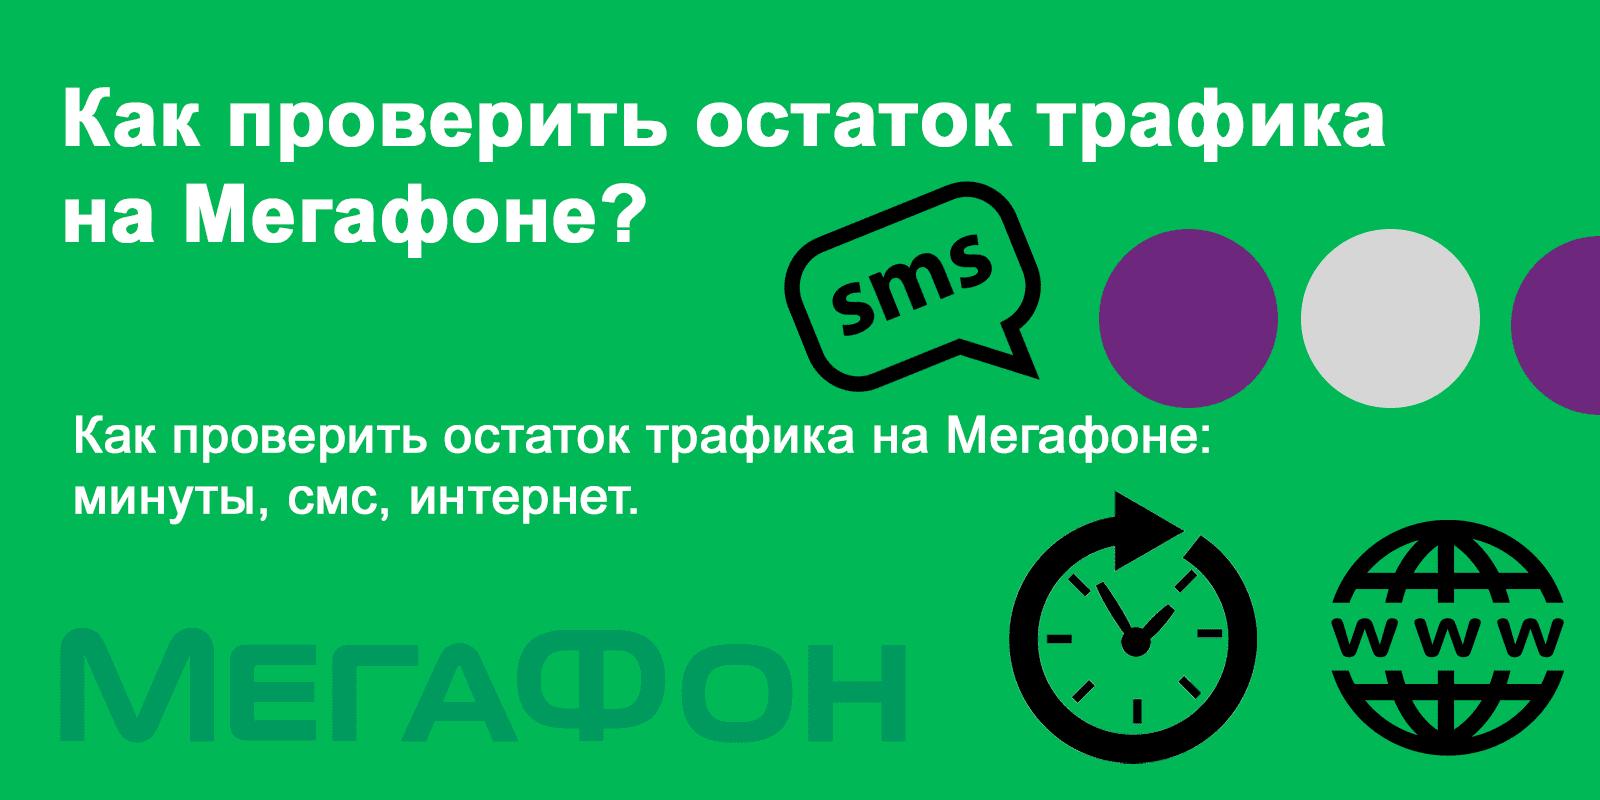 site-megafon-ost-traf.png